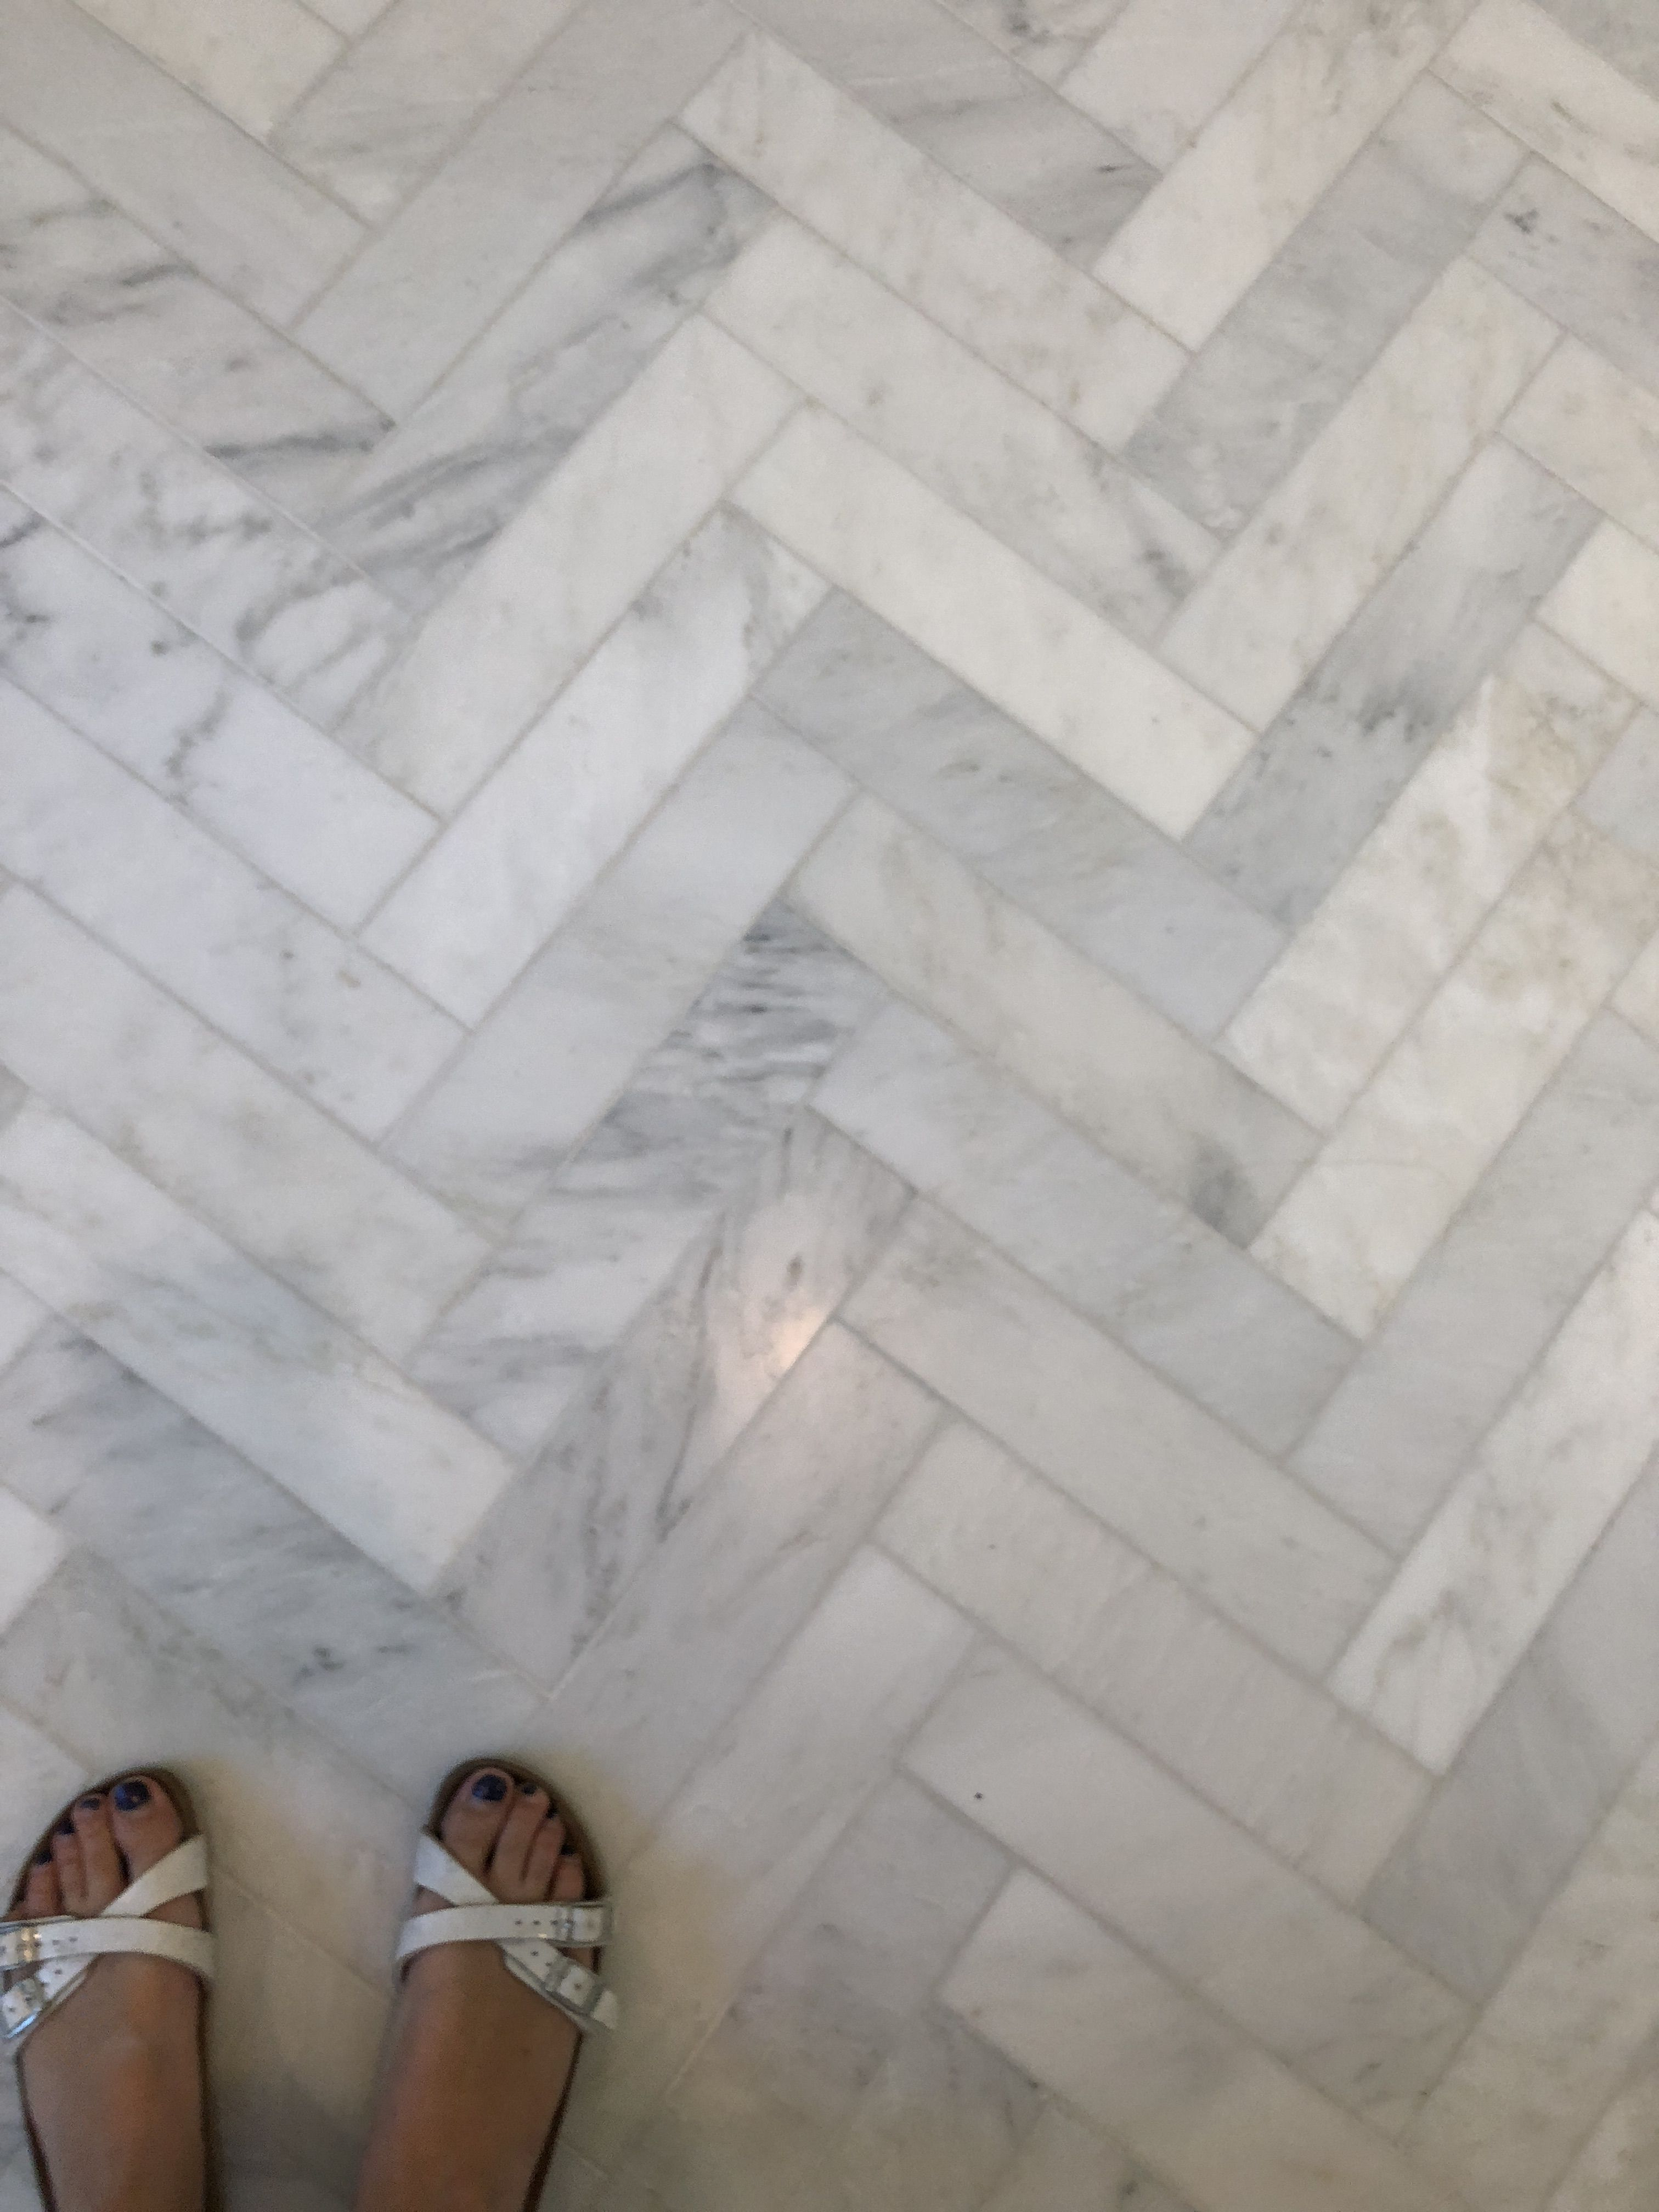 Harringbone Carrara Marble Floor Tile Apron 3 X 10 Main